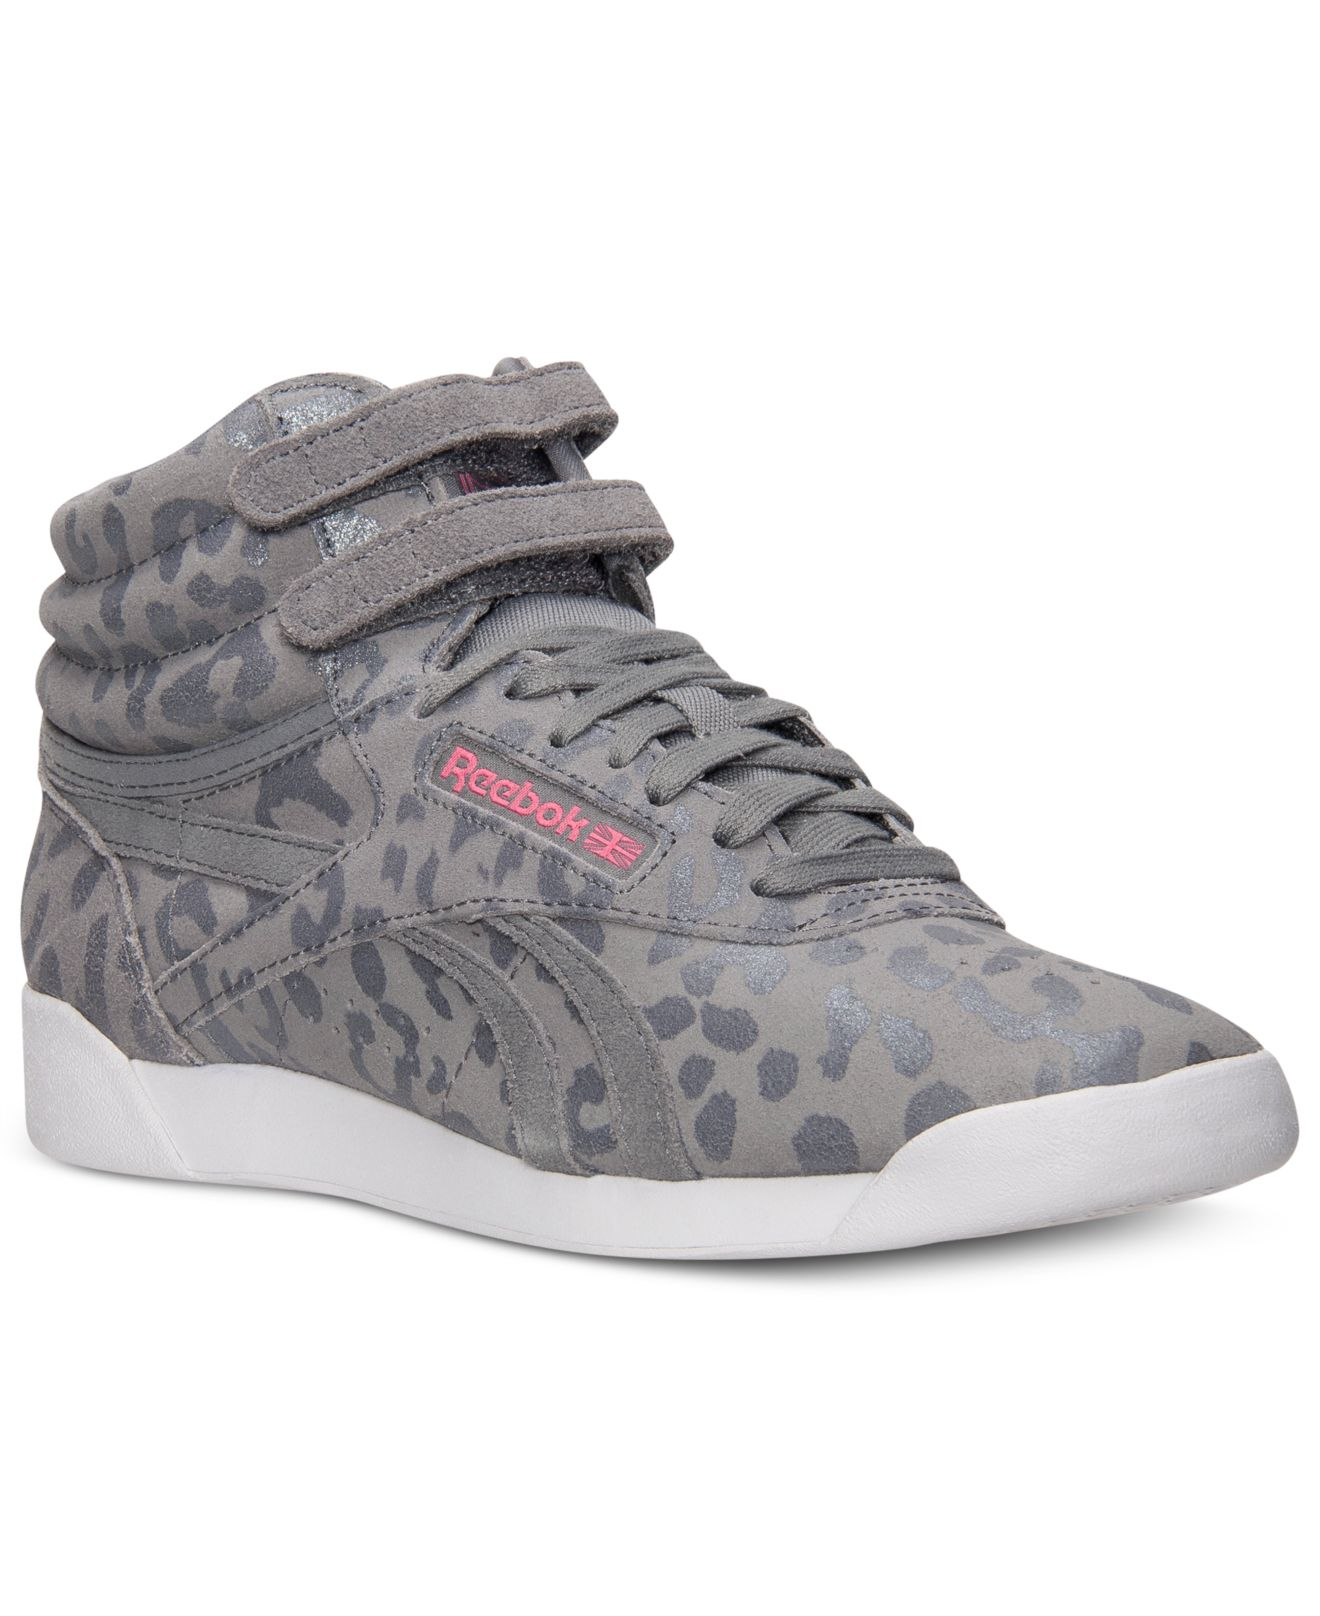 e009ec8fc89 Lyst - Reebok Women s Freestyle Hi Eden Casual Sneakers From Finish ...